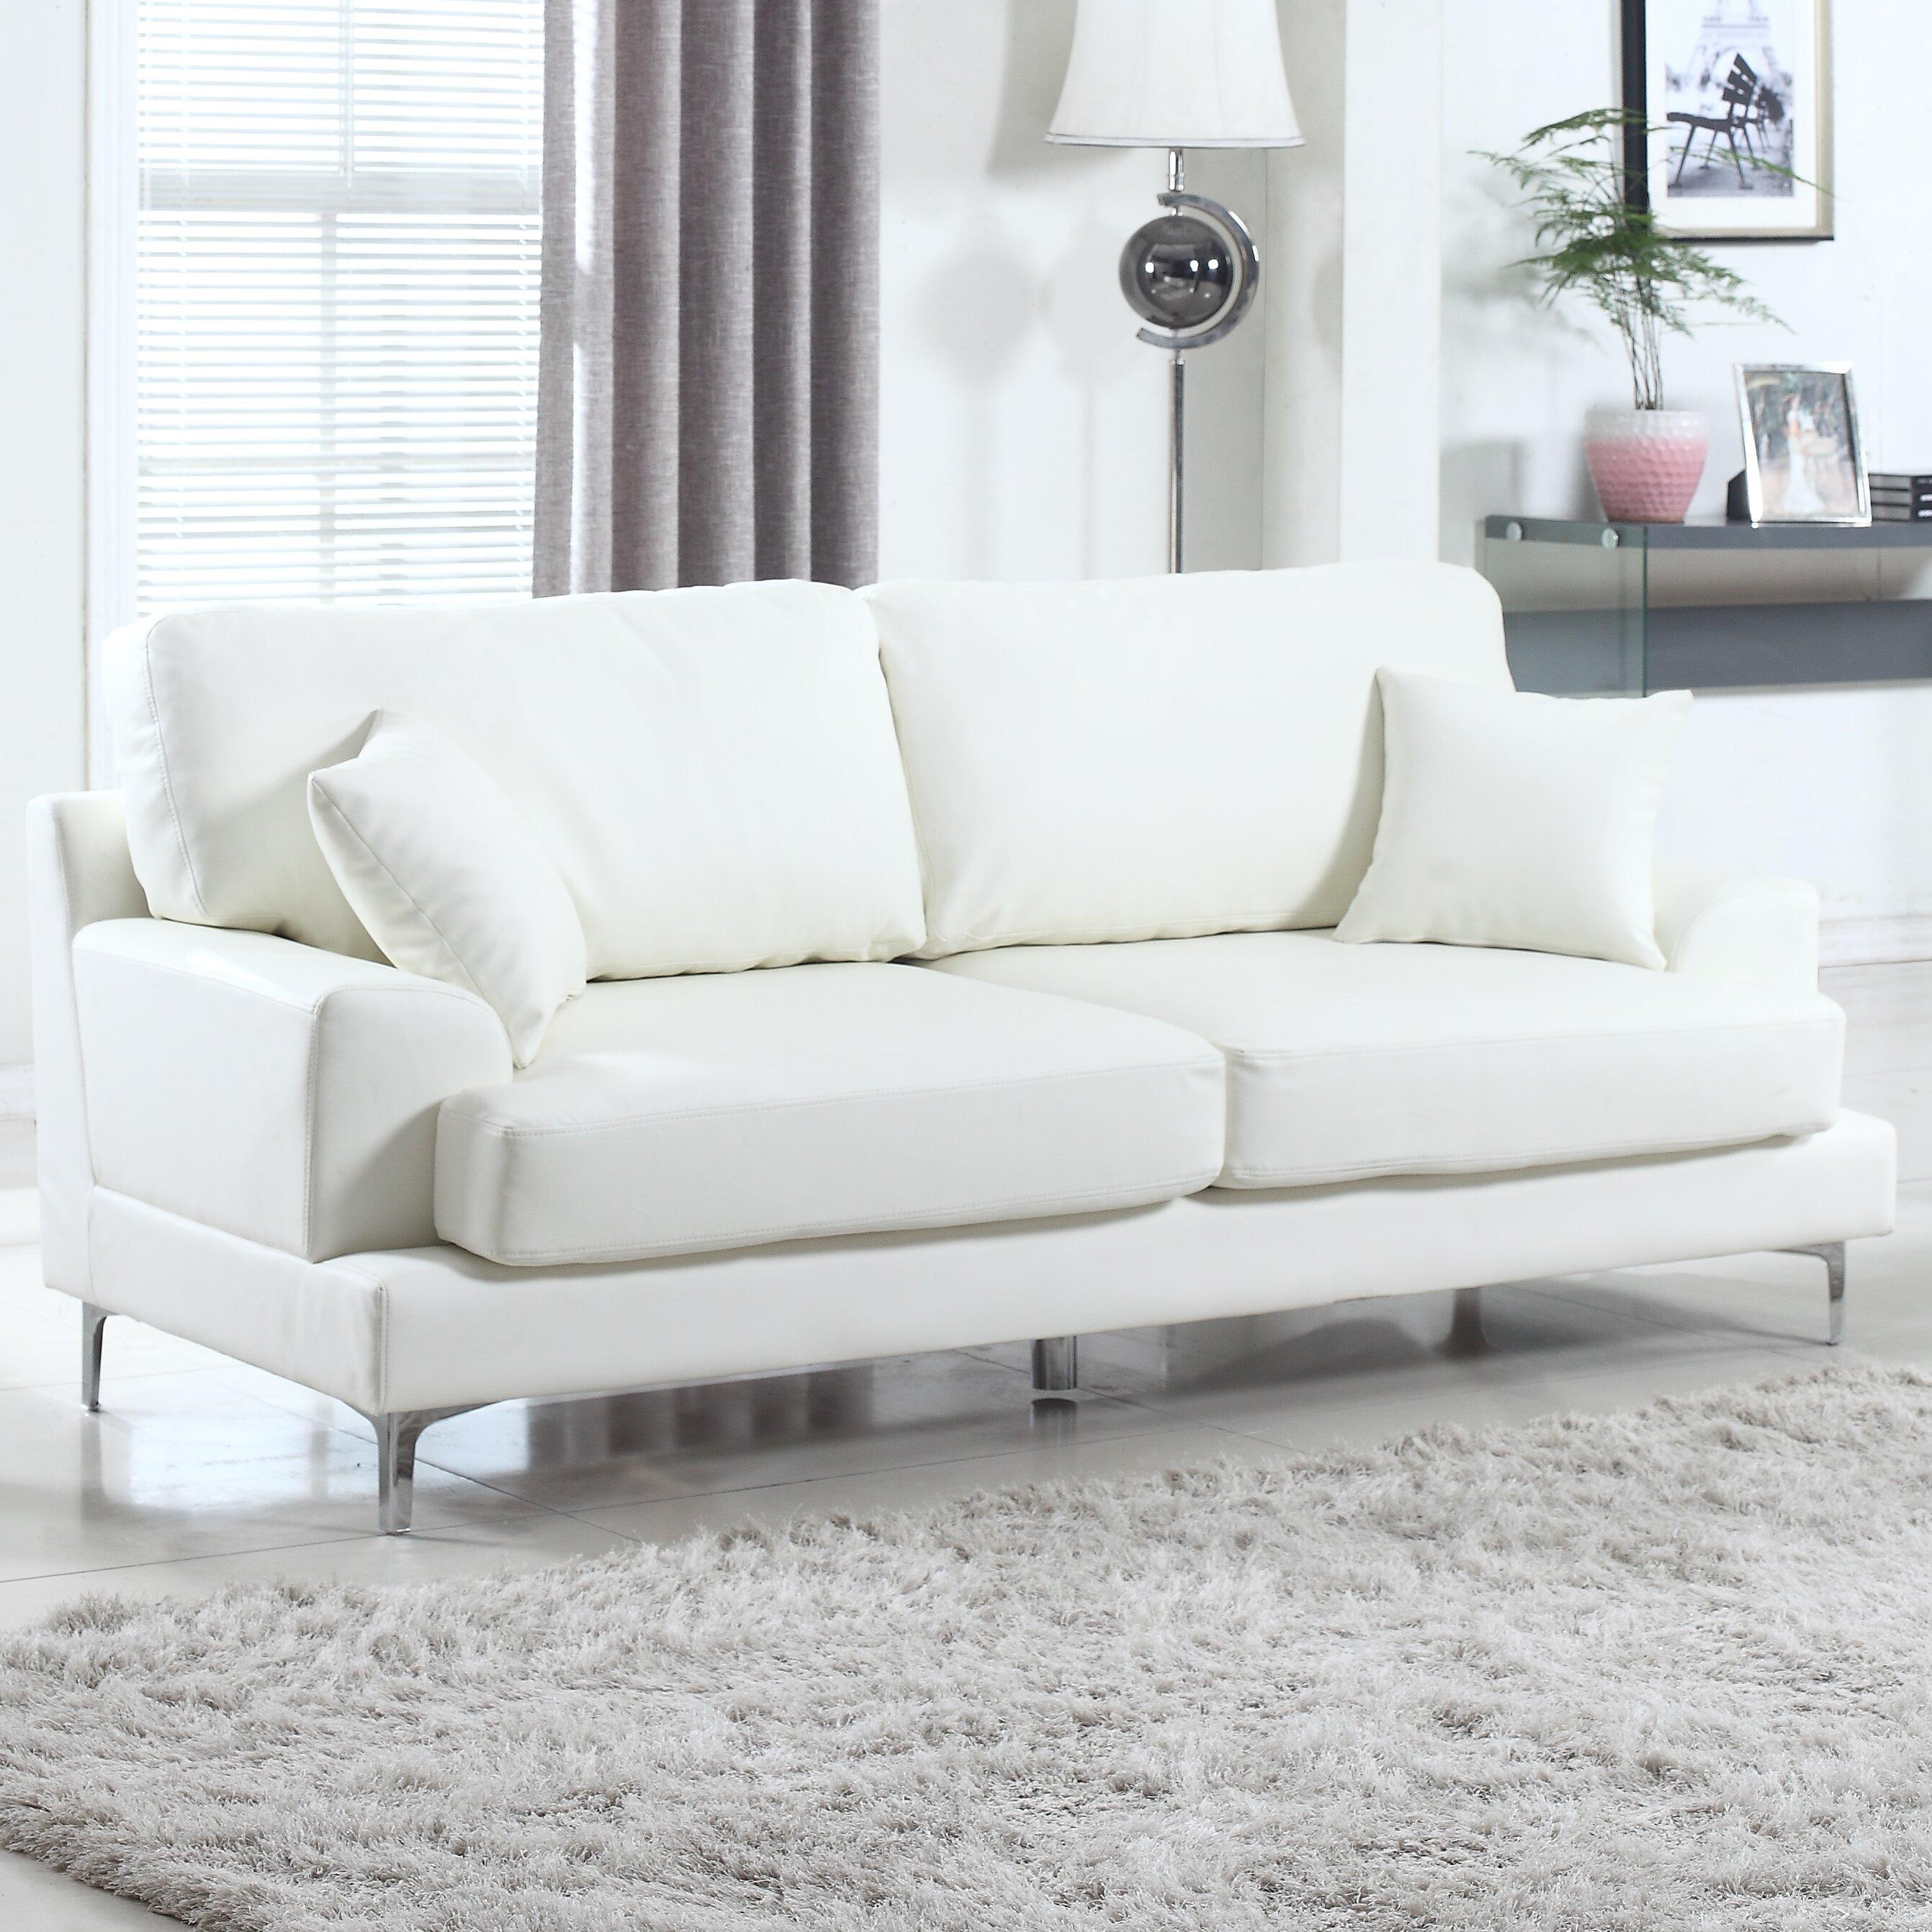 think sofas plush think sofas reviews memsaheb thesofa. Black Bedroom Furniture Sets. Home Design Ideas